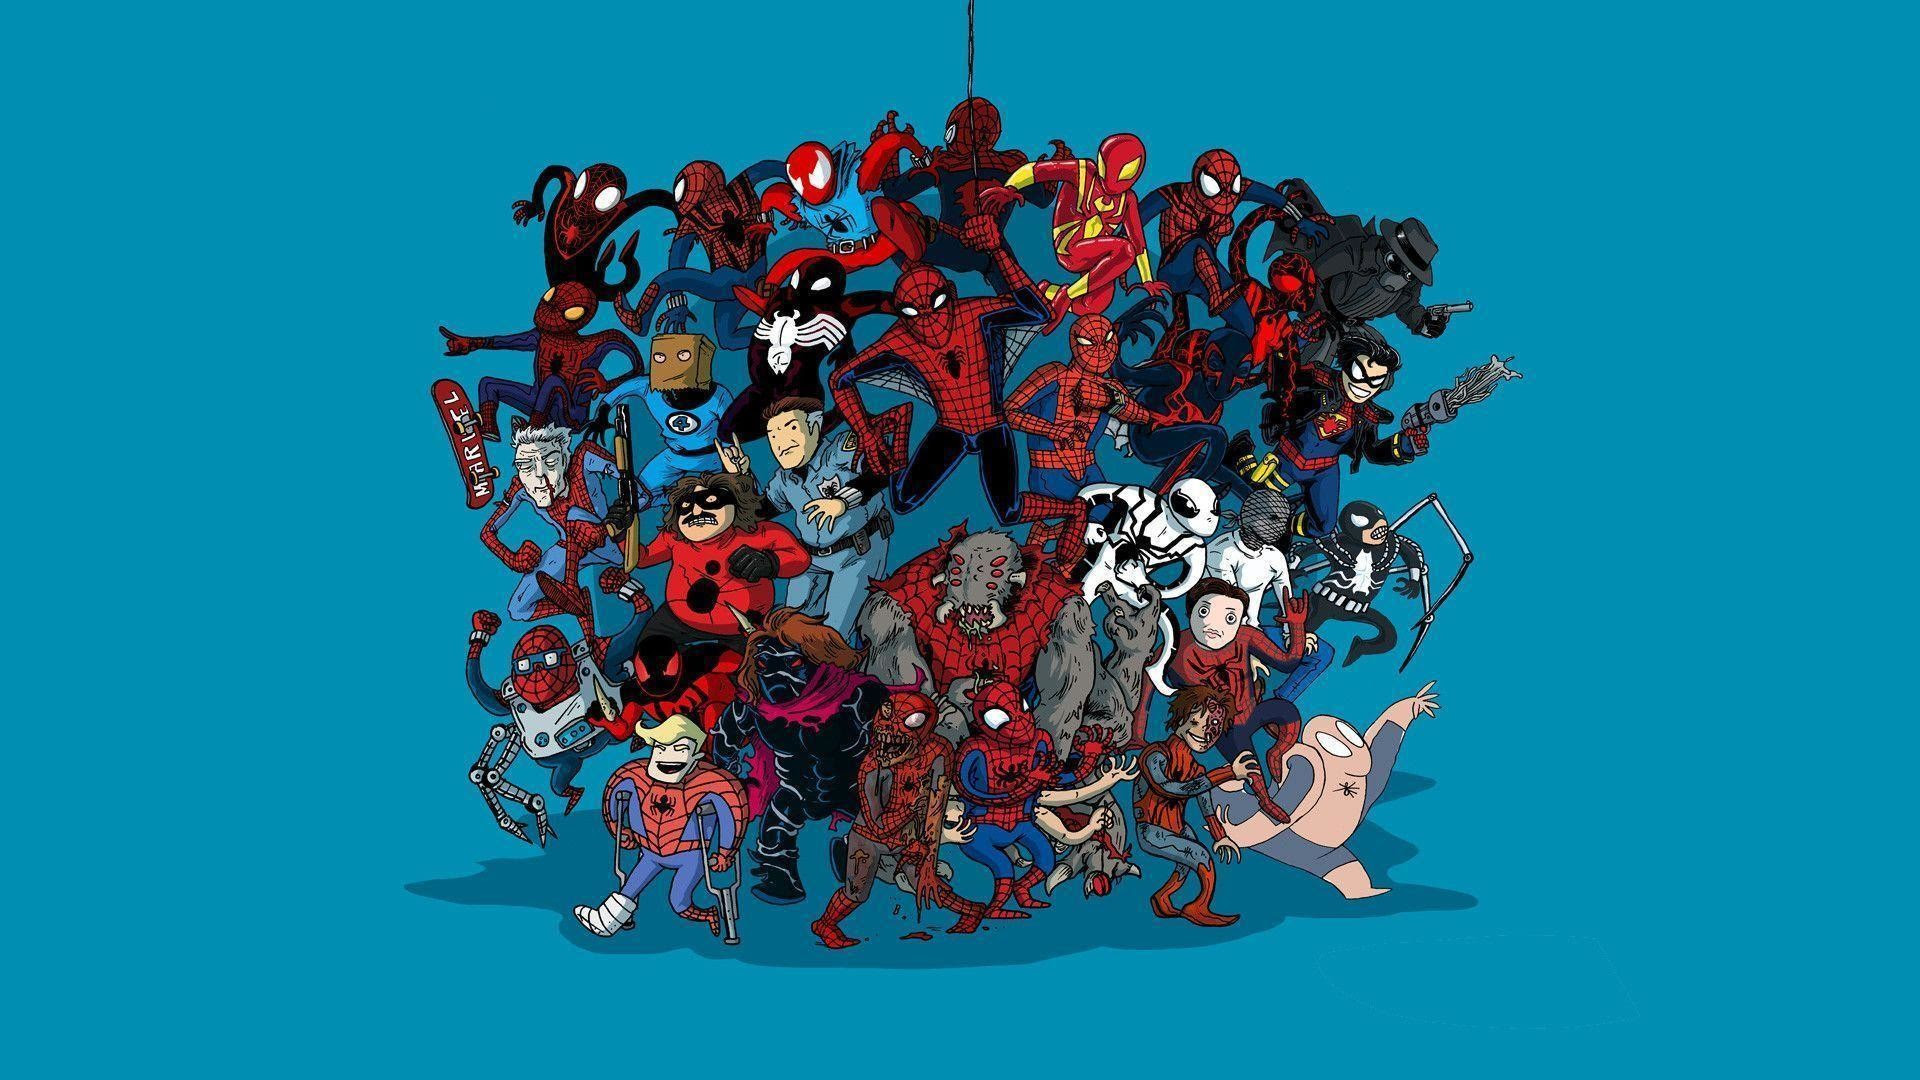 Spider Man 2099 Hd Wallpaper 78 Images